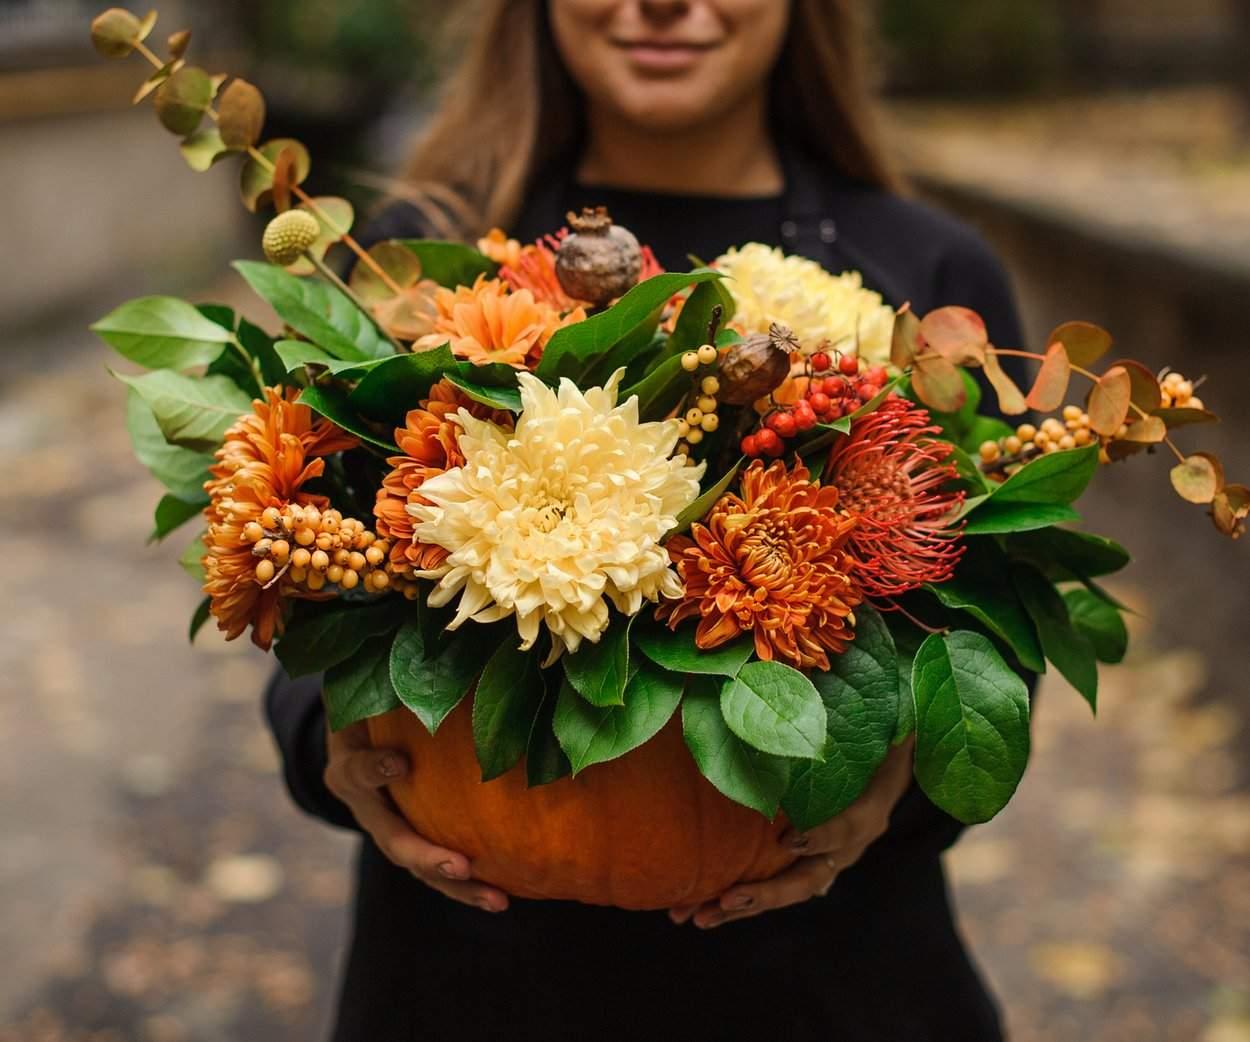 7d1e458b0bb10c19c9ddd004b6 YyAxNTkyeDEzMjcrMjY1KzQyAnJlIDEyNTAgMTA0MgNiZjdlOGIwOWQwYg== woman holding a pumpkin with autumn flowers